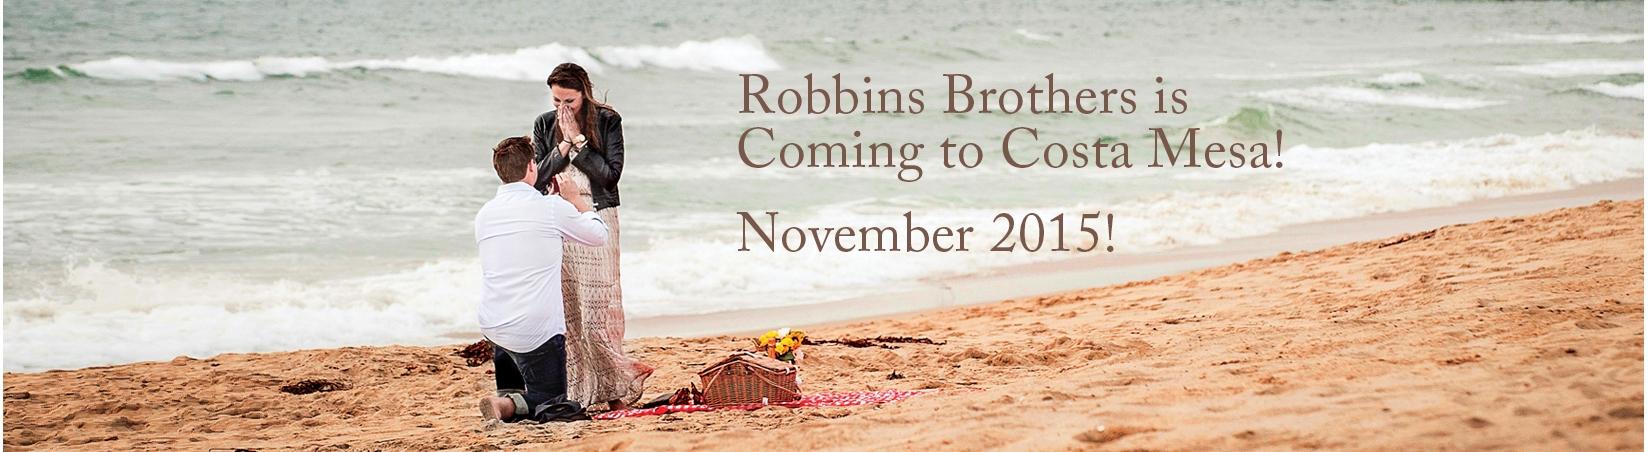 Costa Mesa Robbins Brothers